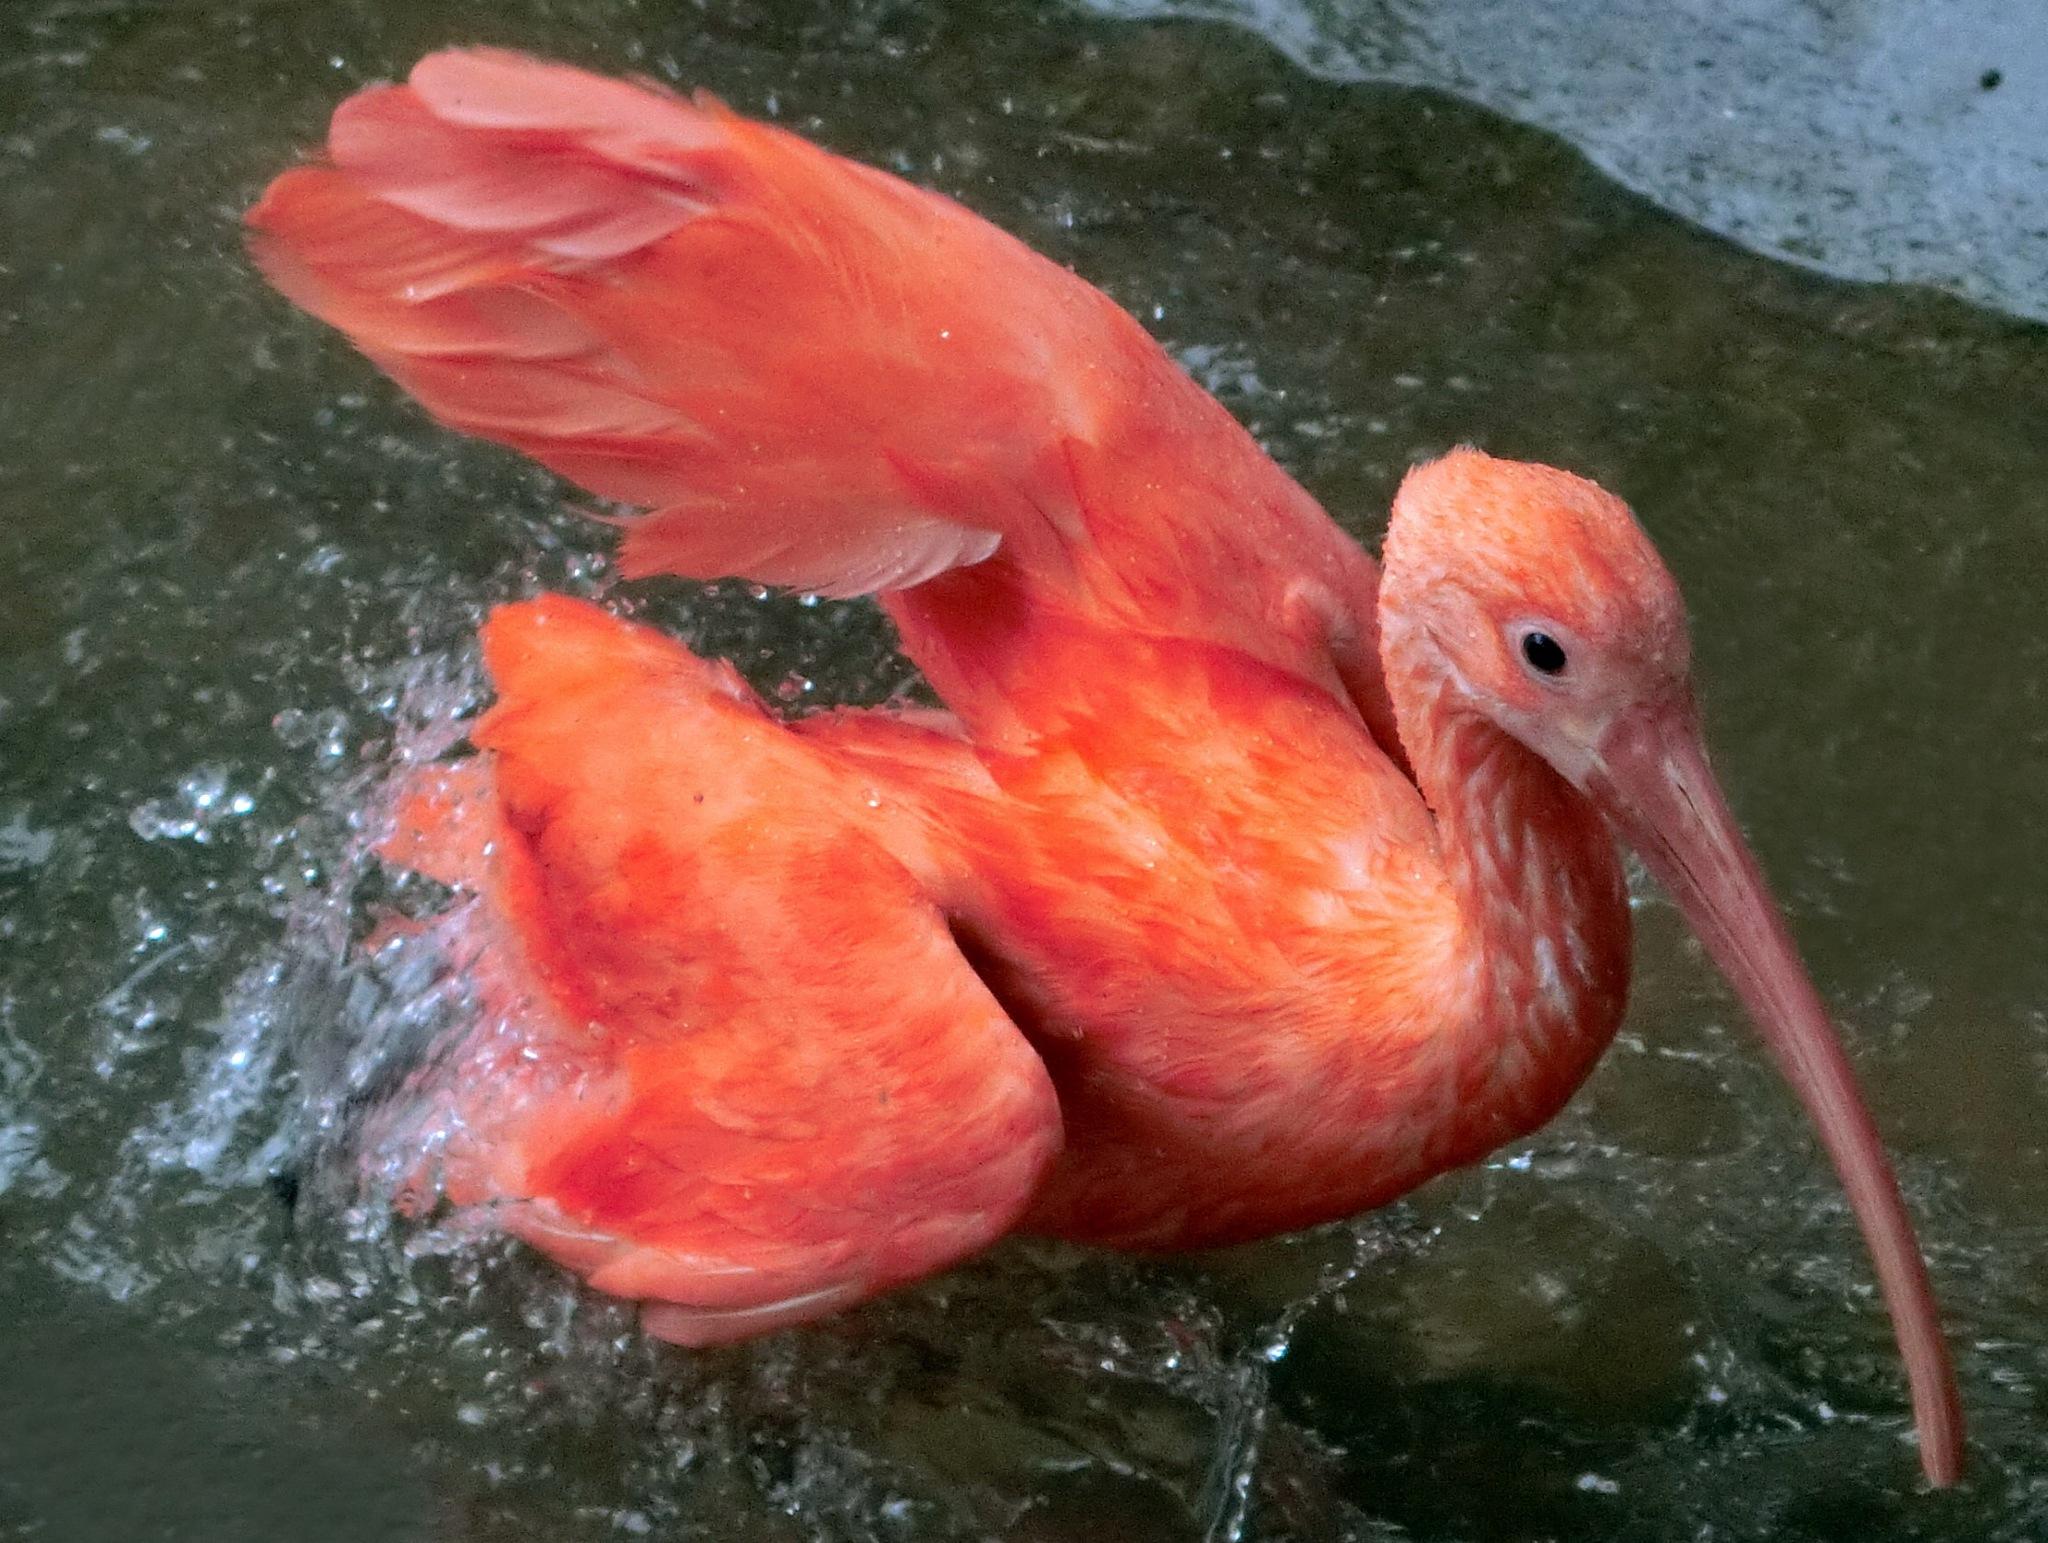 Scarlet Ibis in water-1 by pop88123